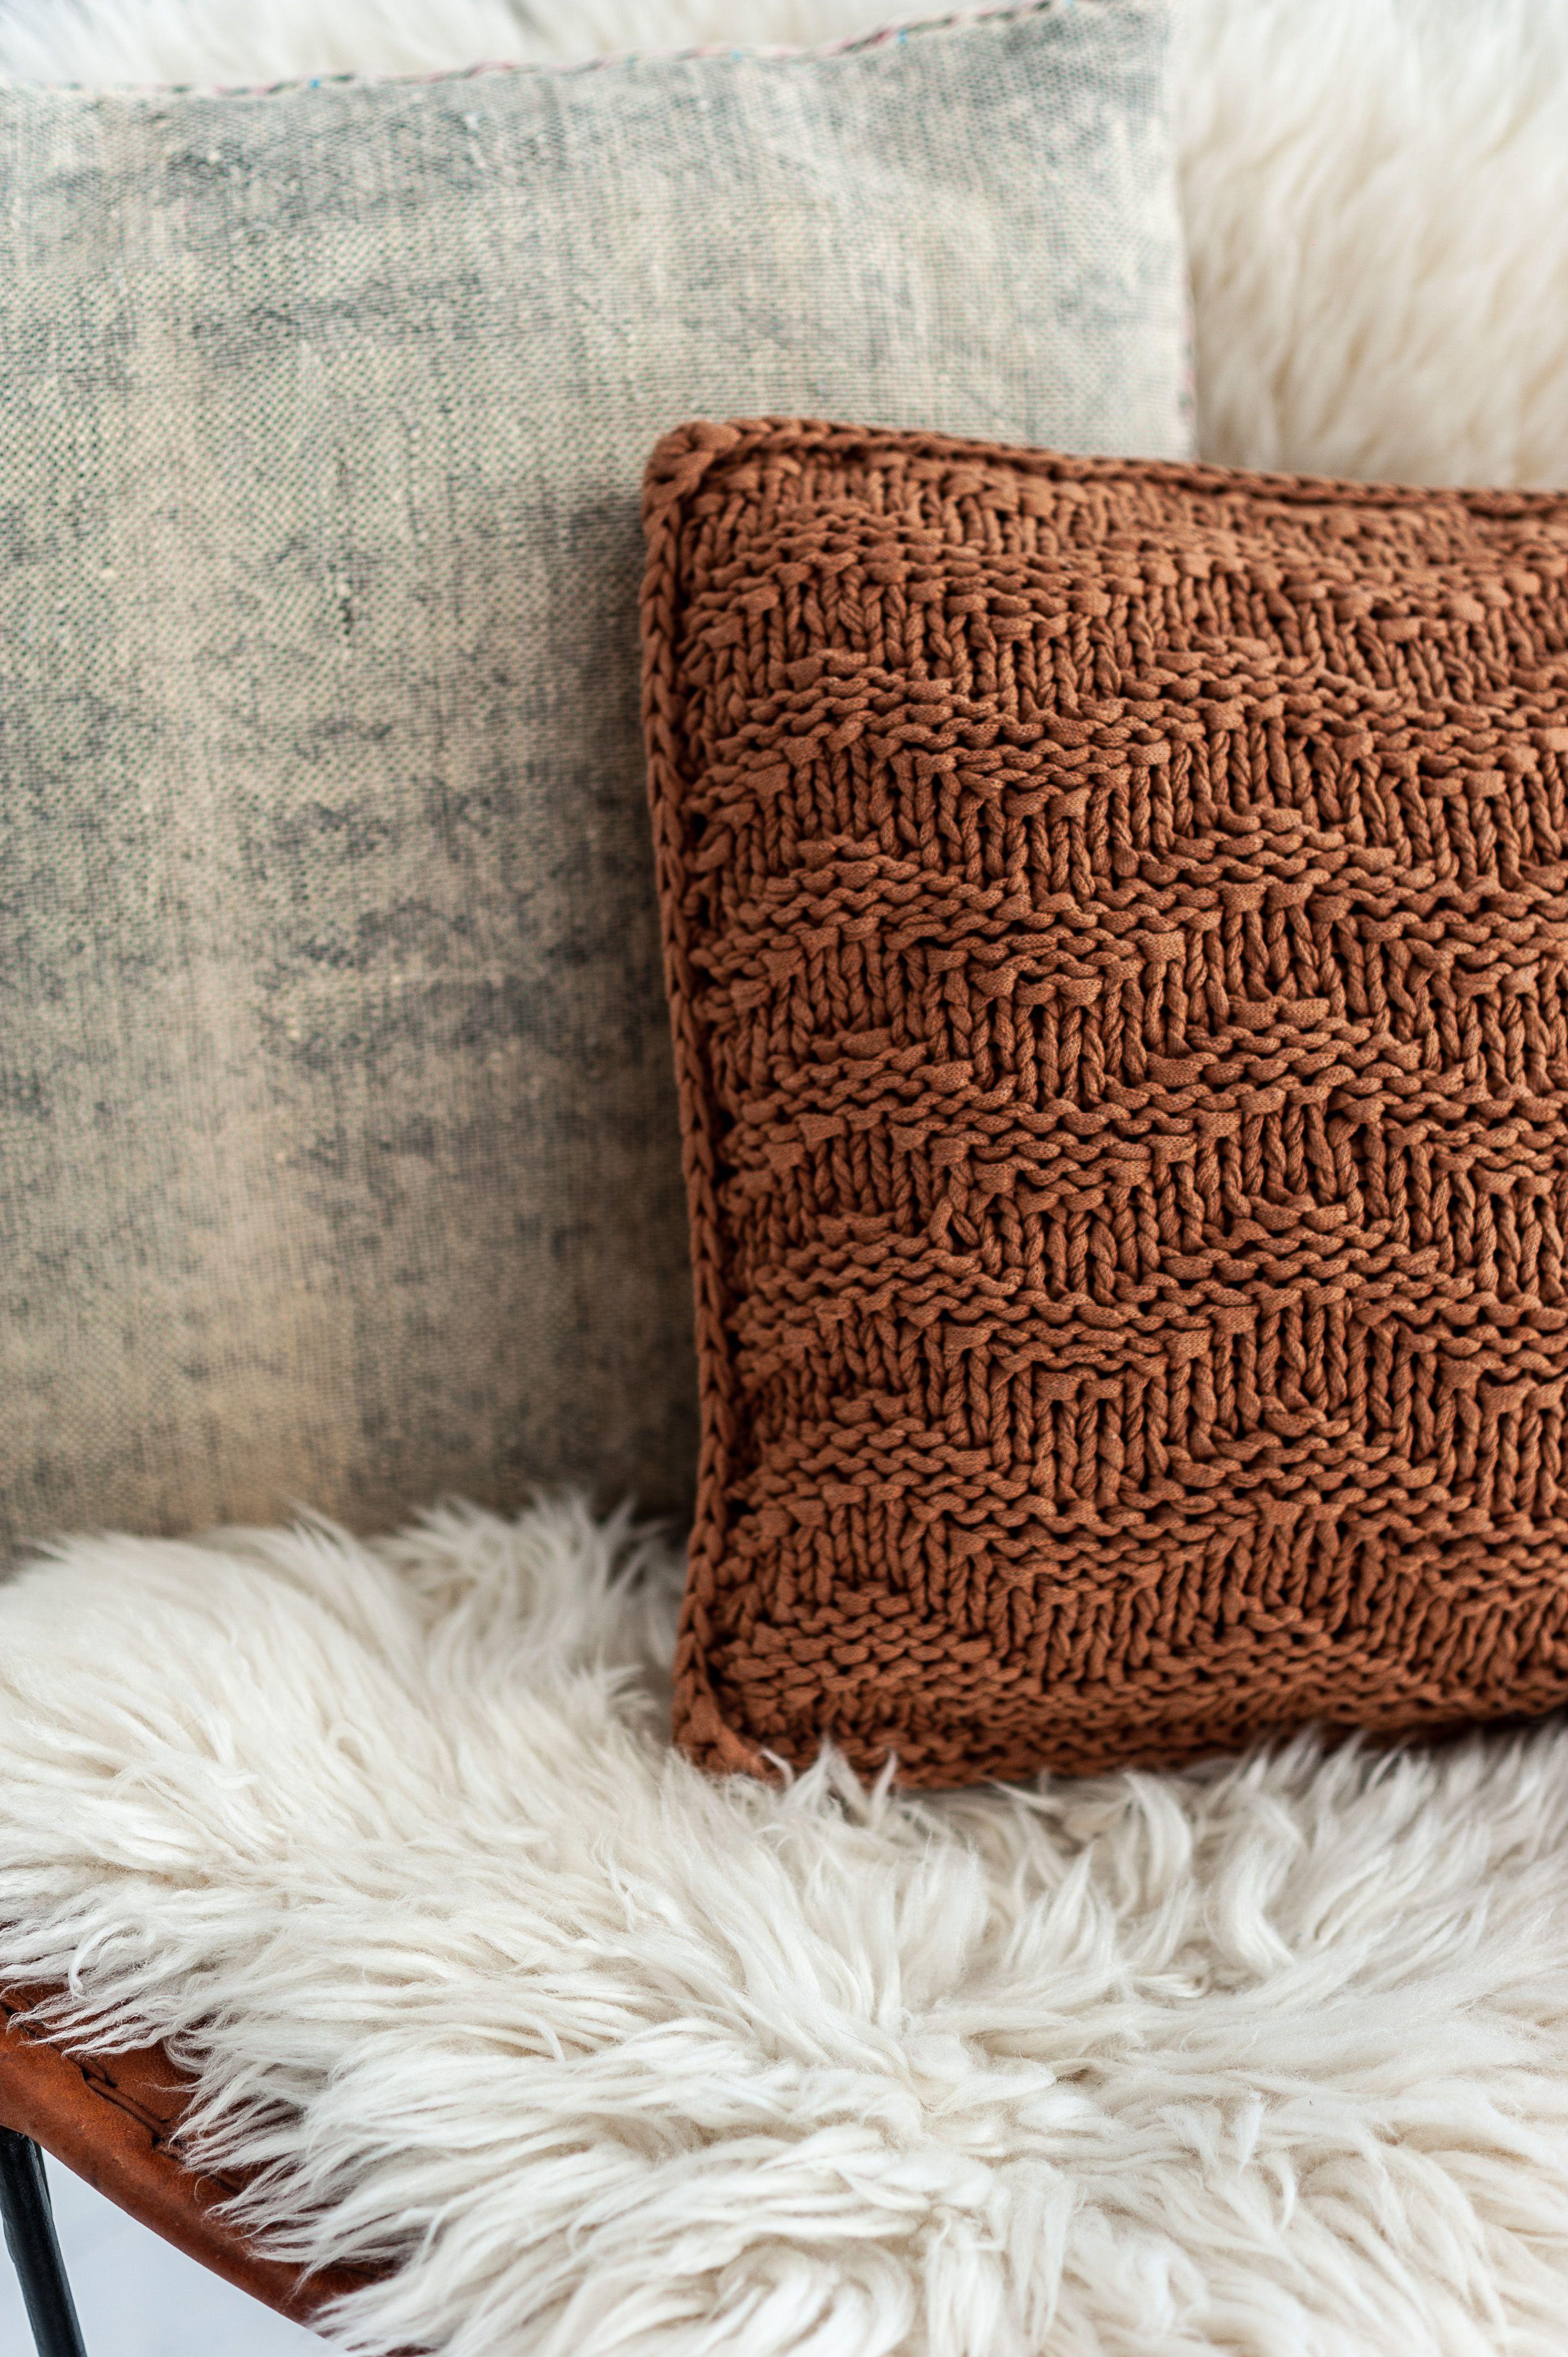 Diy knit kit cushion bulky textures caramel brown